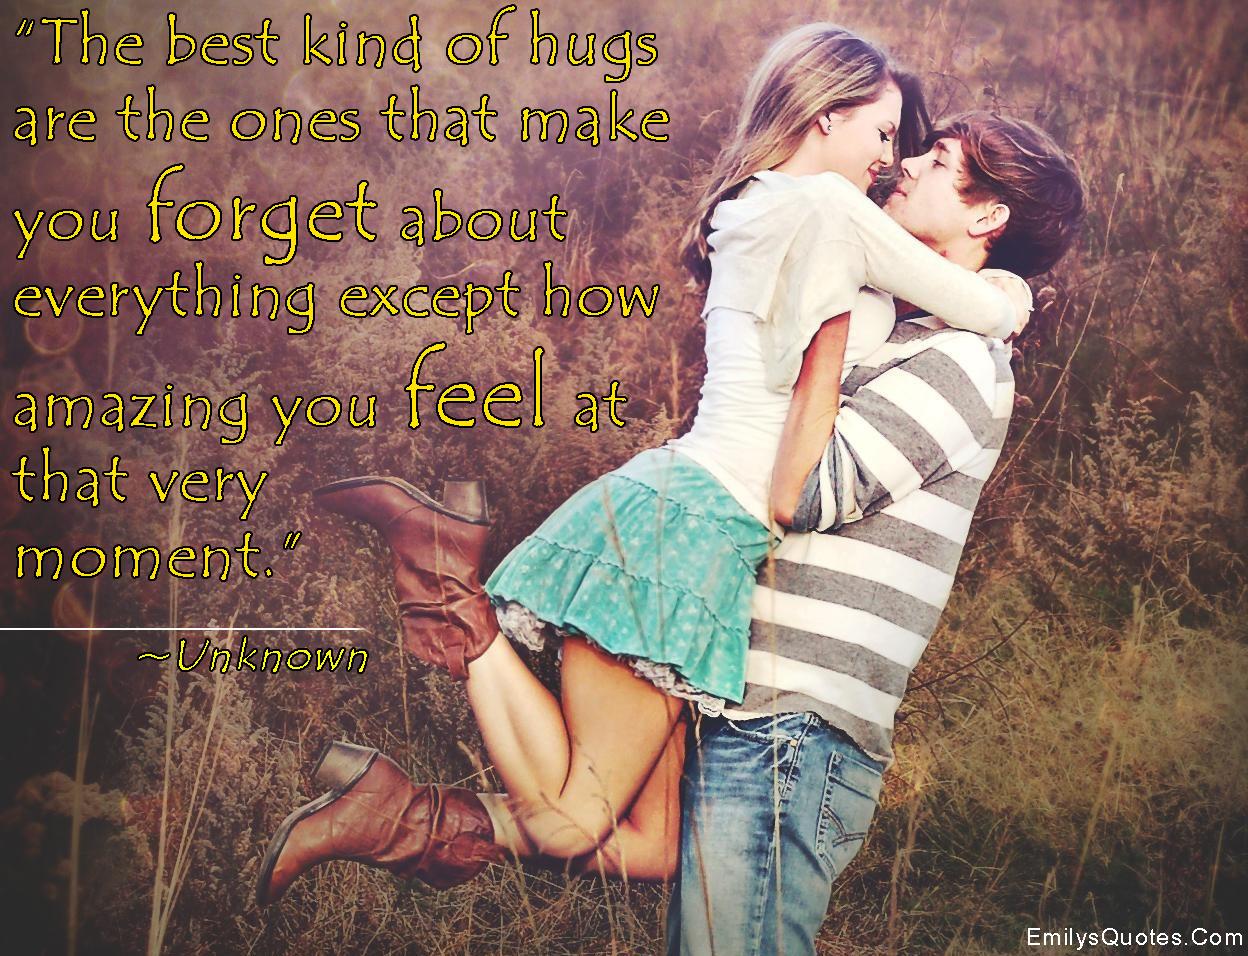 EmilysQuotes.Com - hug, forget, amazing, feelings, unknown, love, romantic, positive